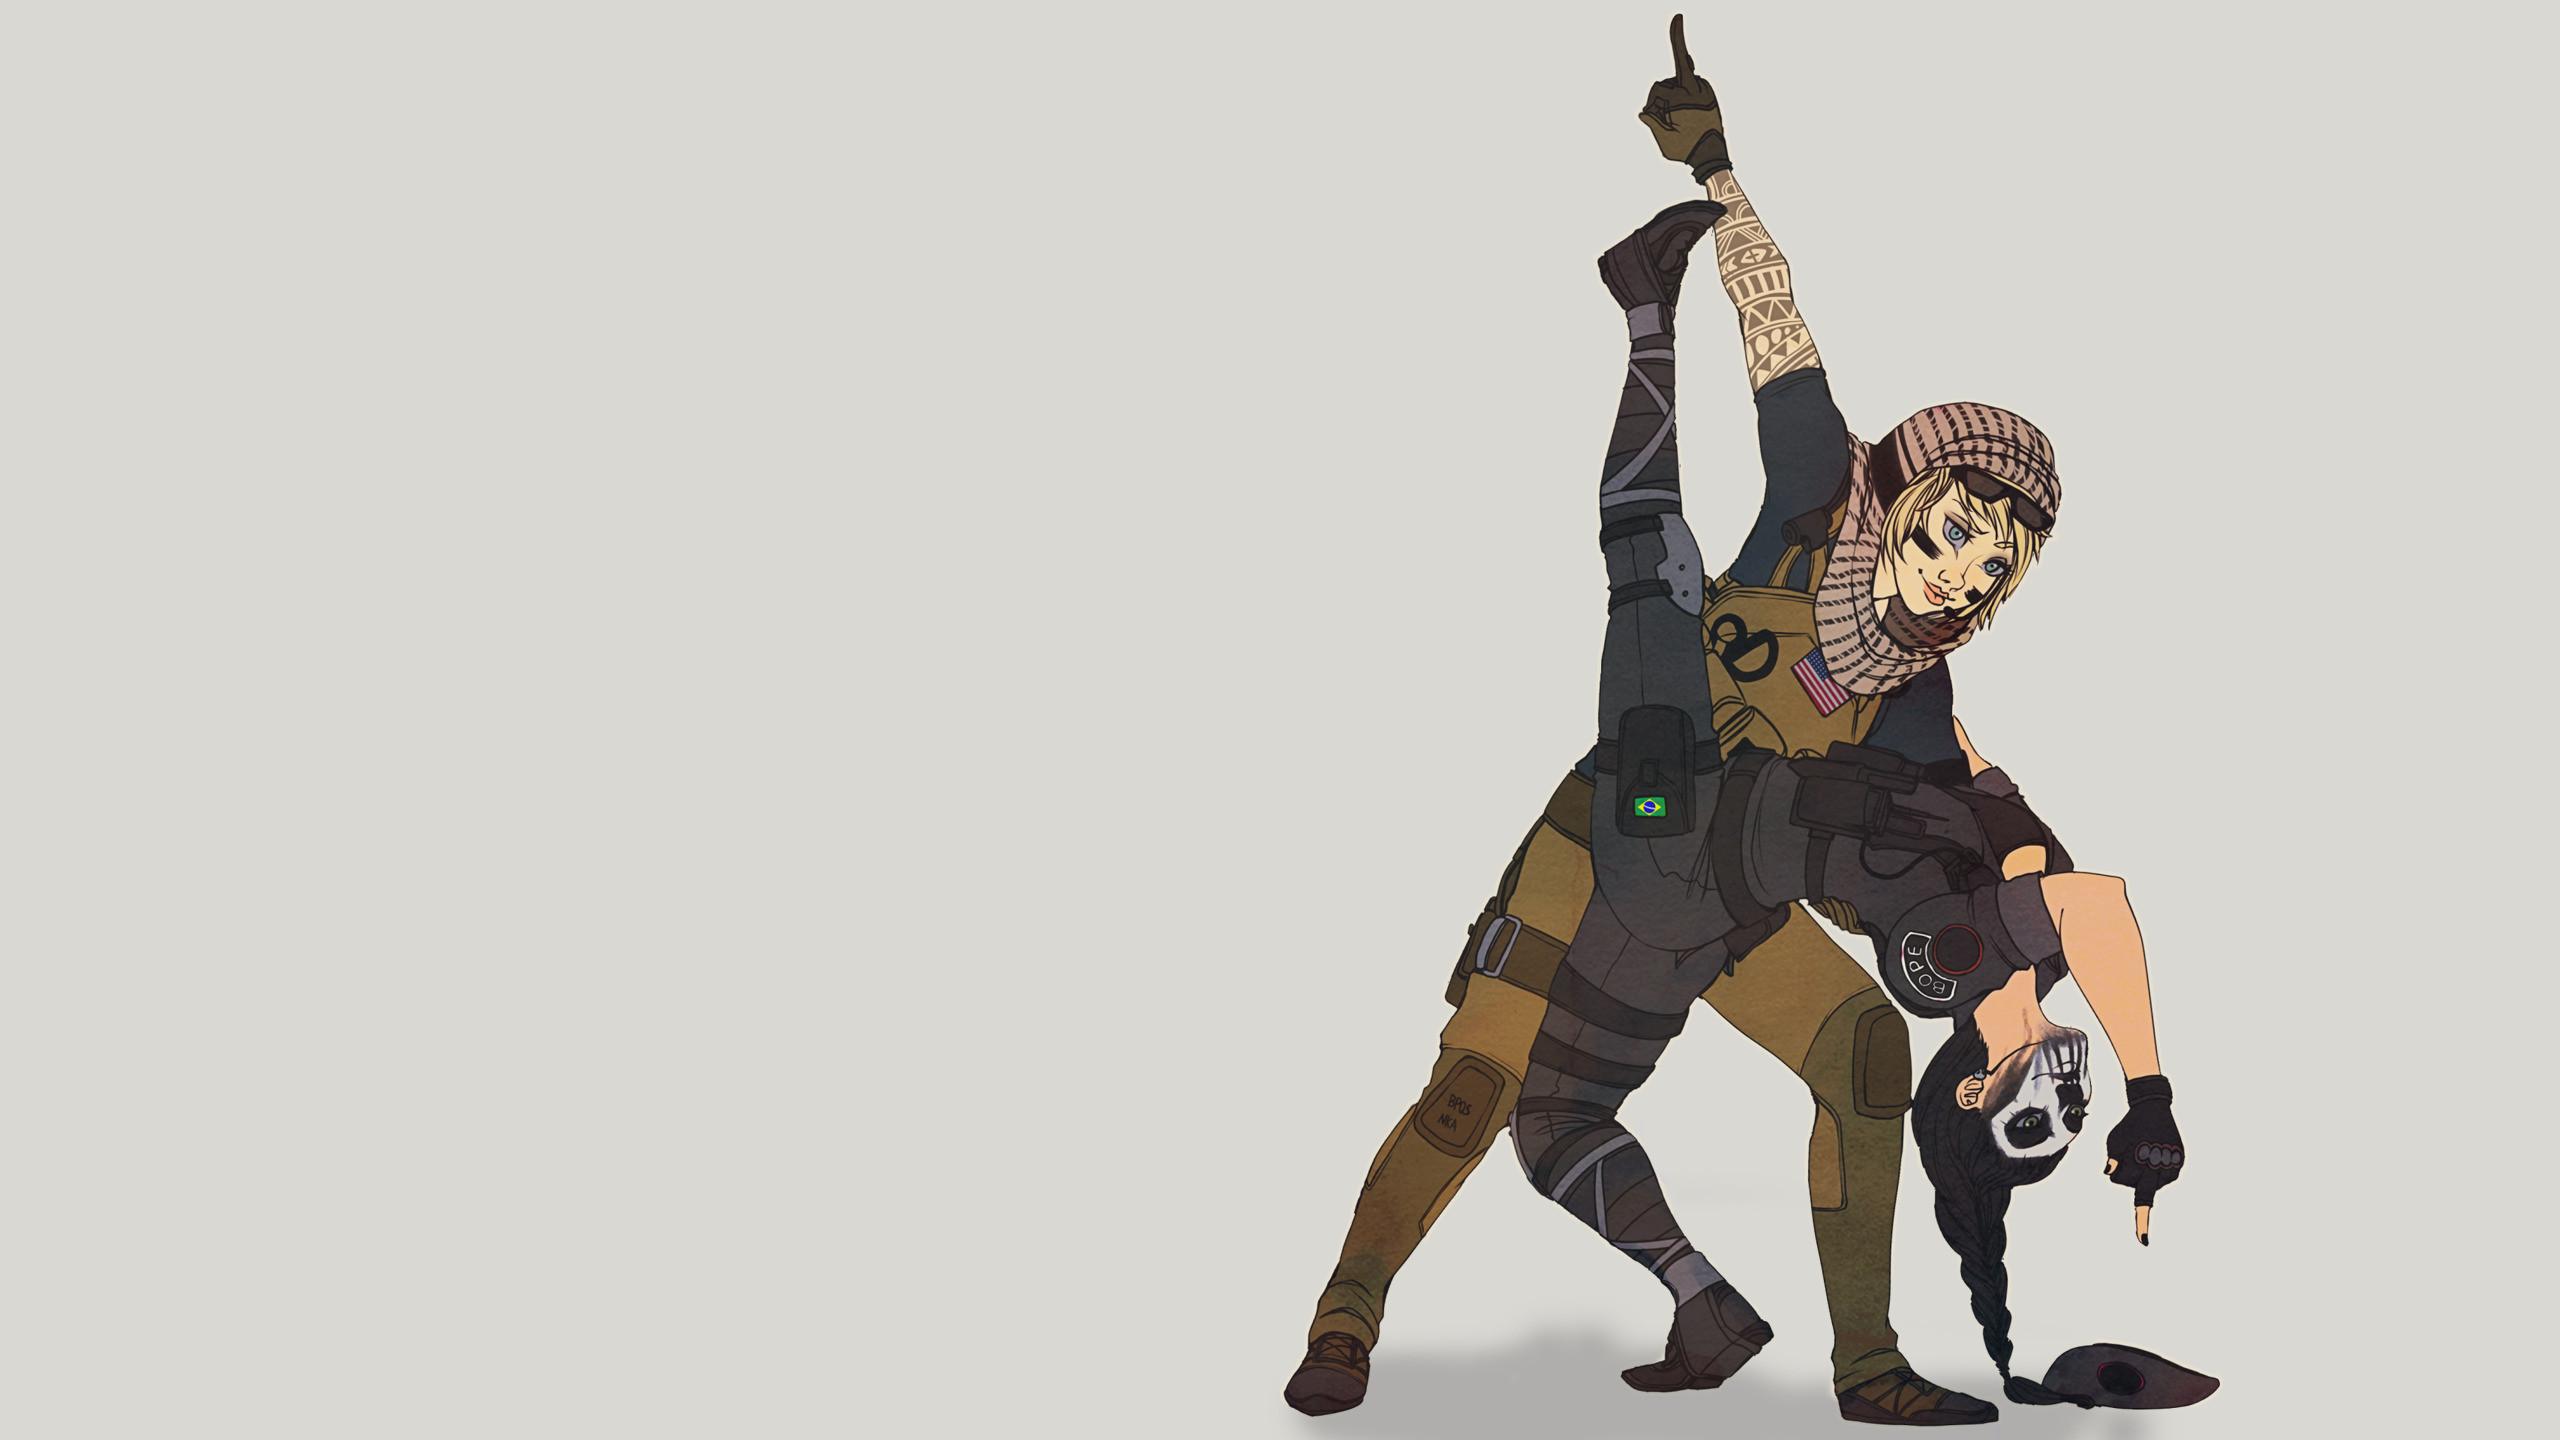 Caveira, Tom Clancy, Rainbow Six - Rainbow Six Siege Cartoon - HD Wallpaper